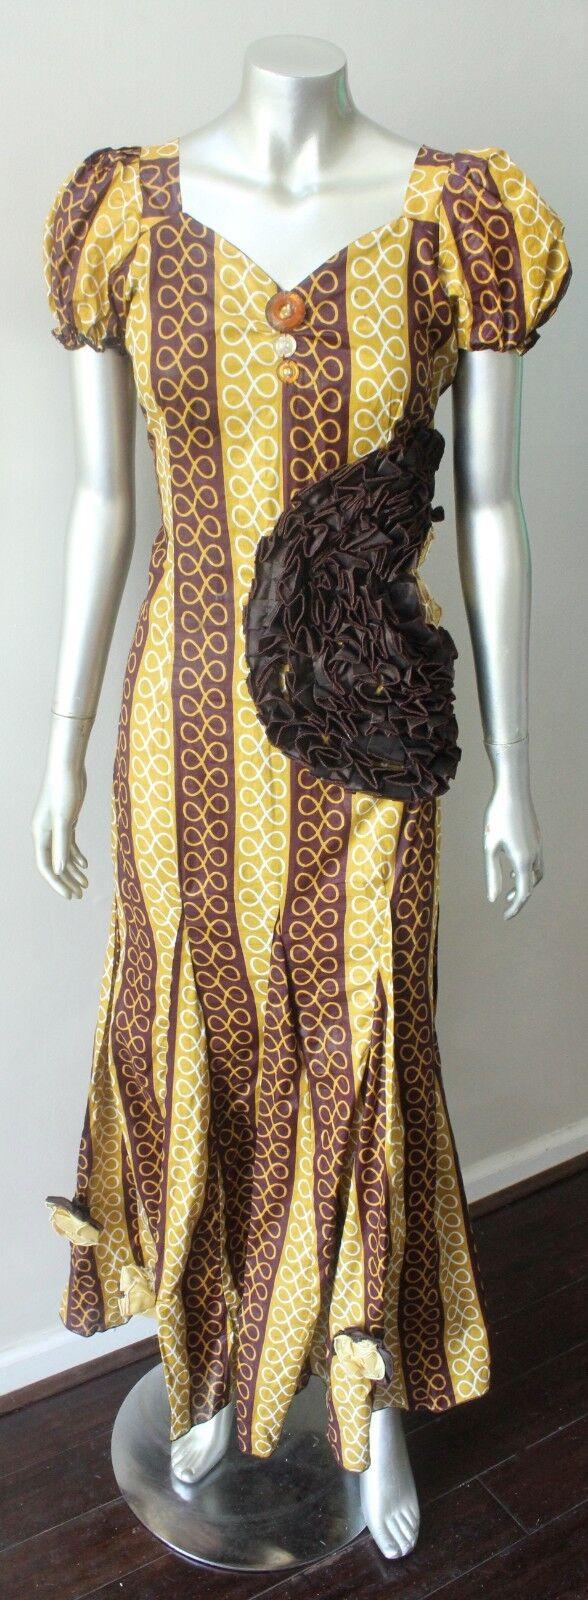 Ankara Wax Print Mermaid African Ruffled Maxi Ethnic Brown Traditional Dress S